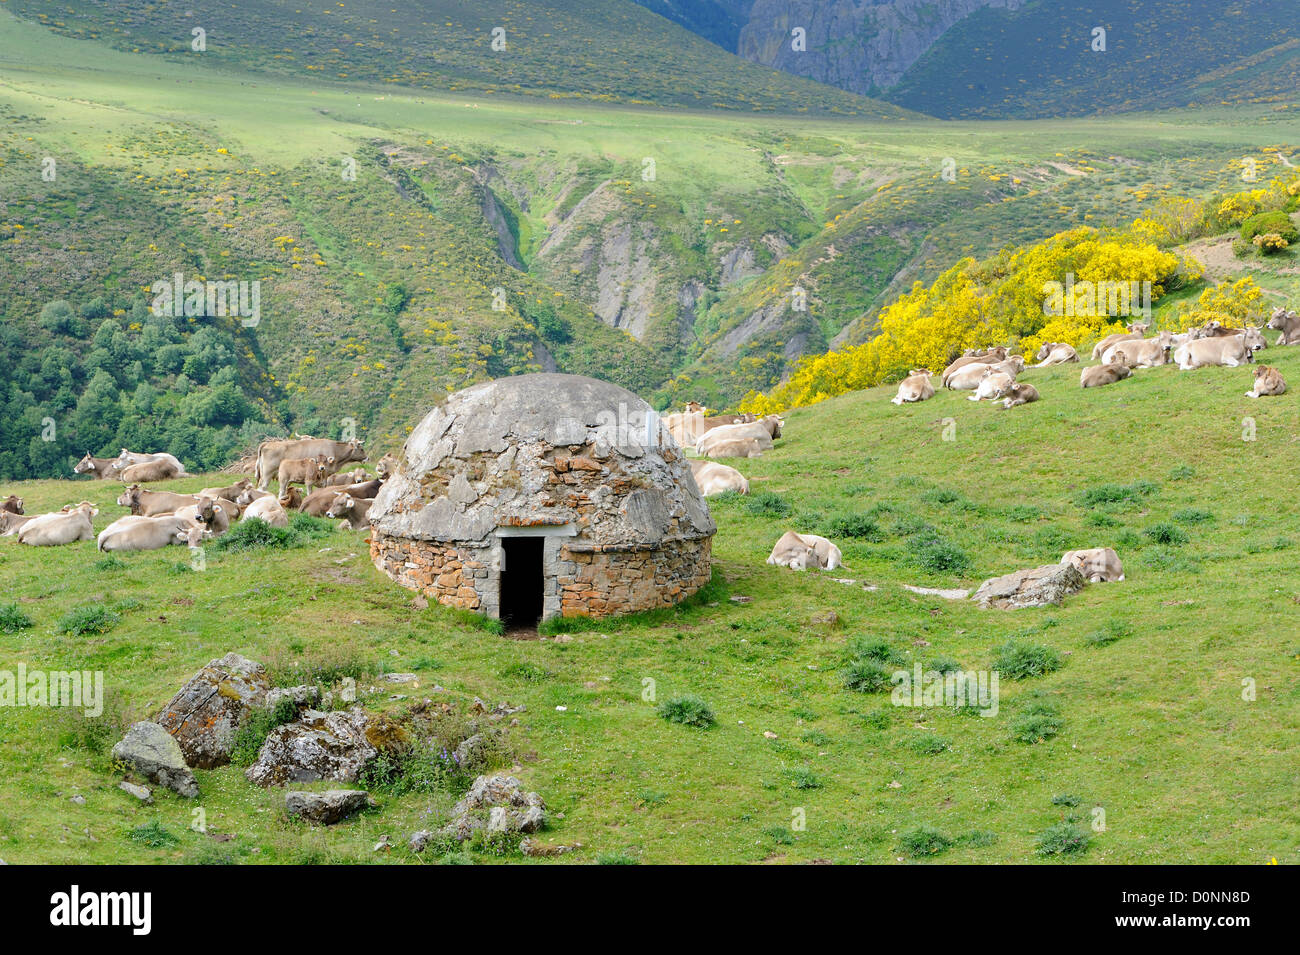 Round stone-built herder's hut.  Picos de Europa Asturias, Spain. - Stock Image